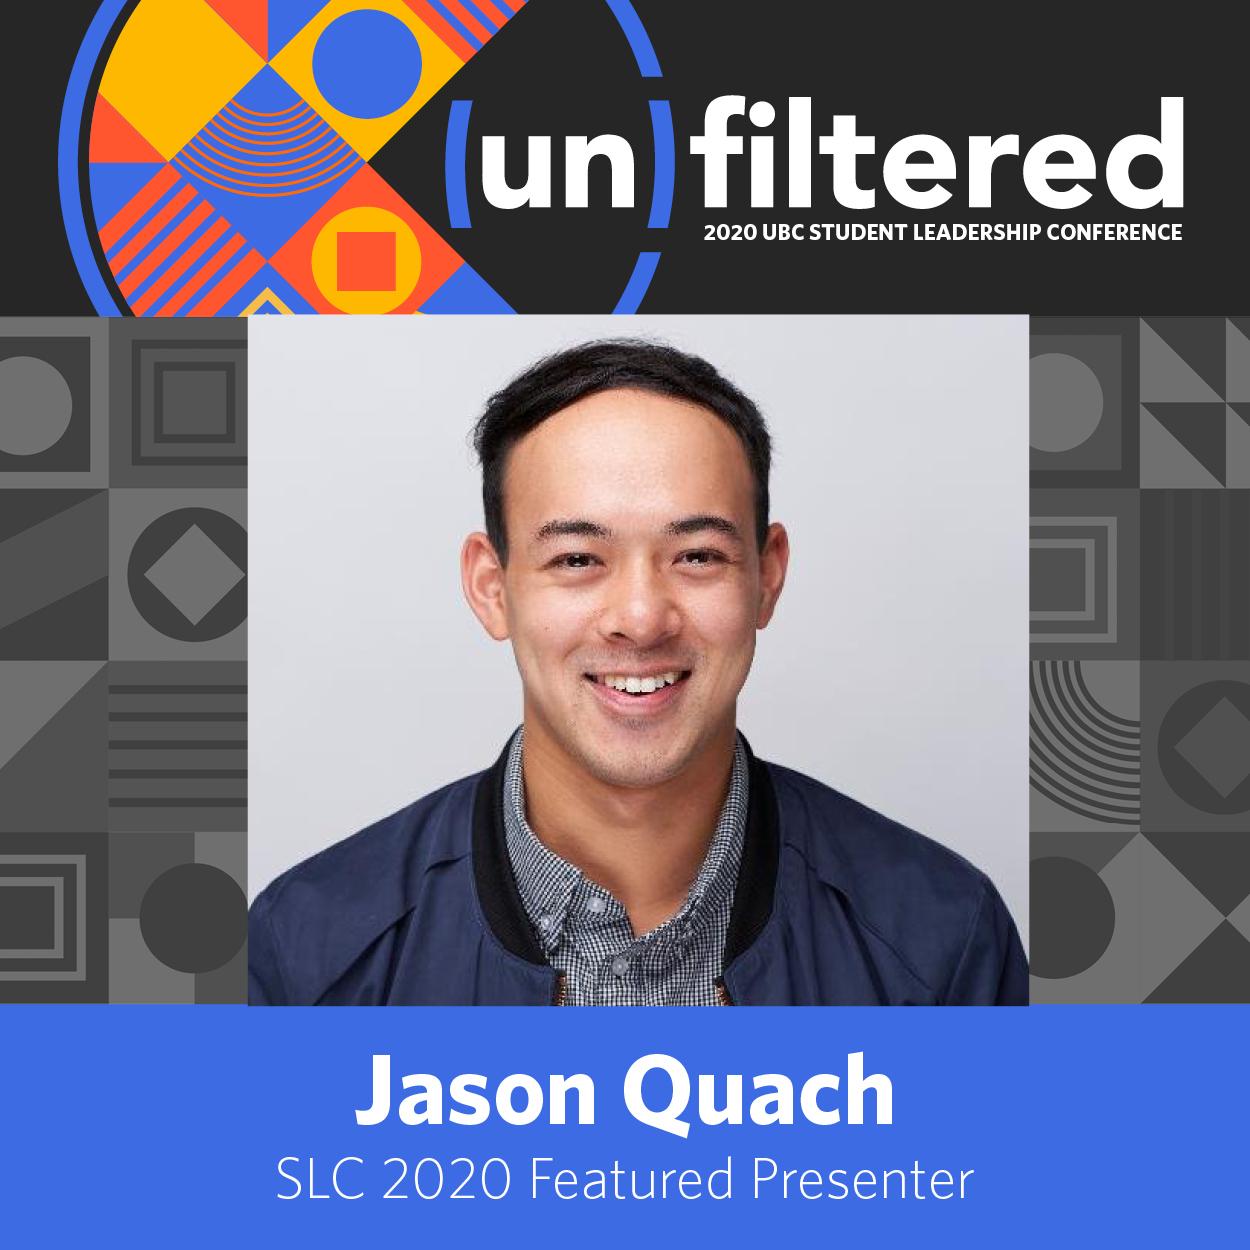 Jason Quach Featured Presenter